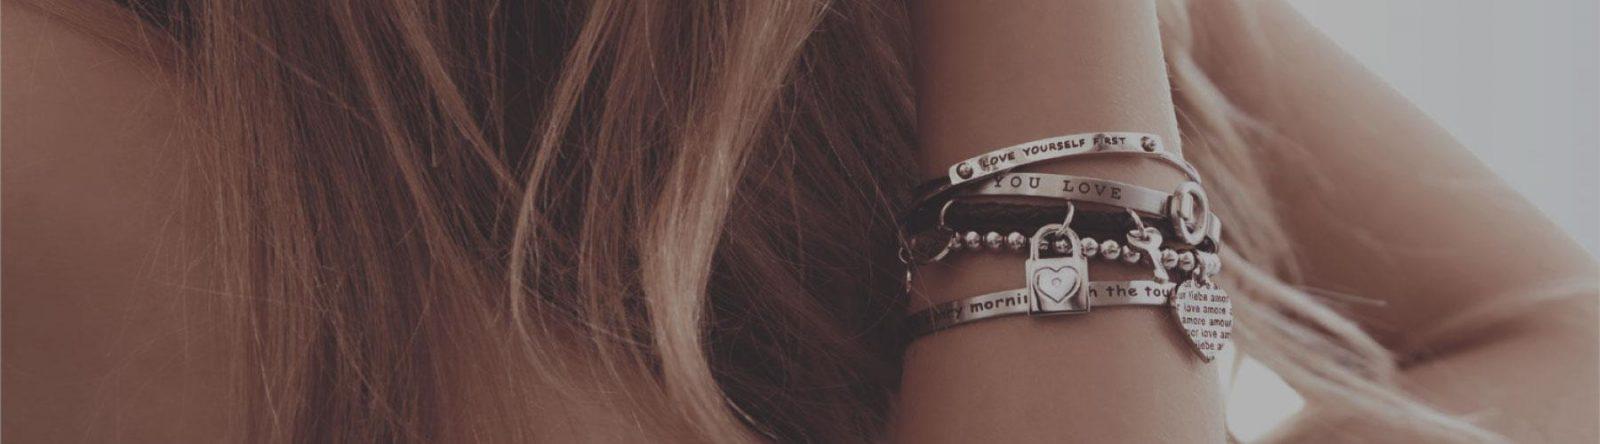 Immagine bracciali kidult love